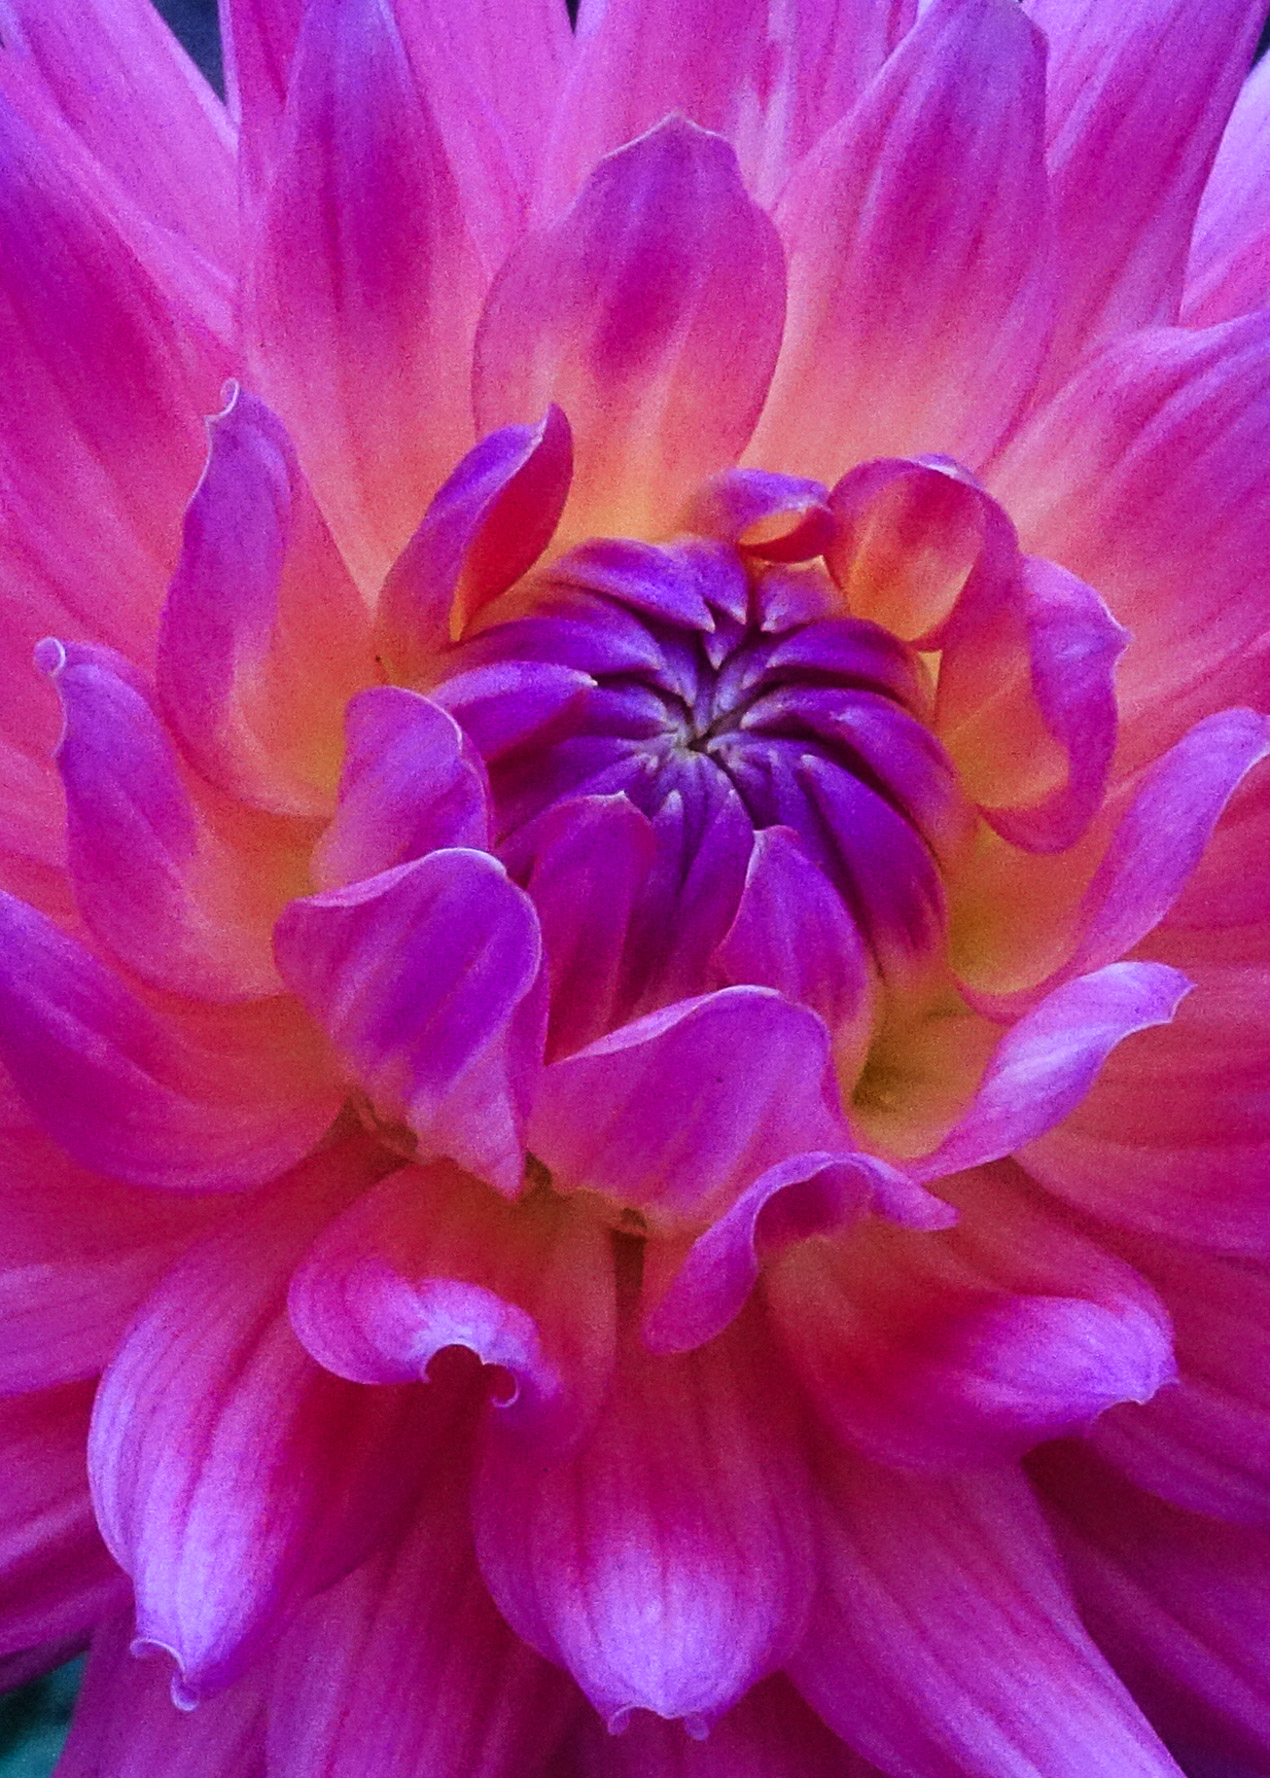 151214 Dahlia light puple  5x7-2.jpg